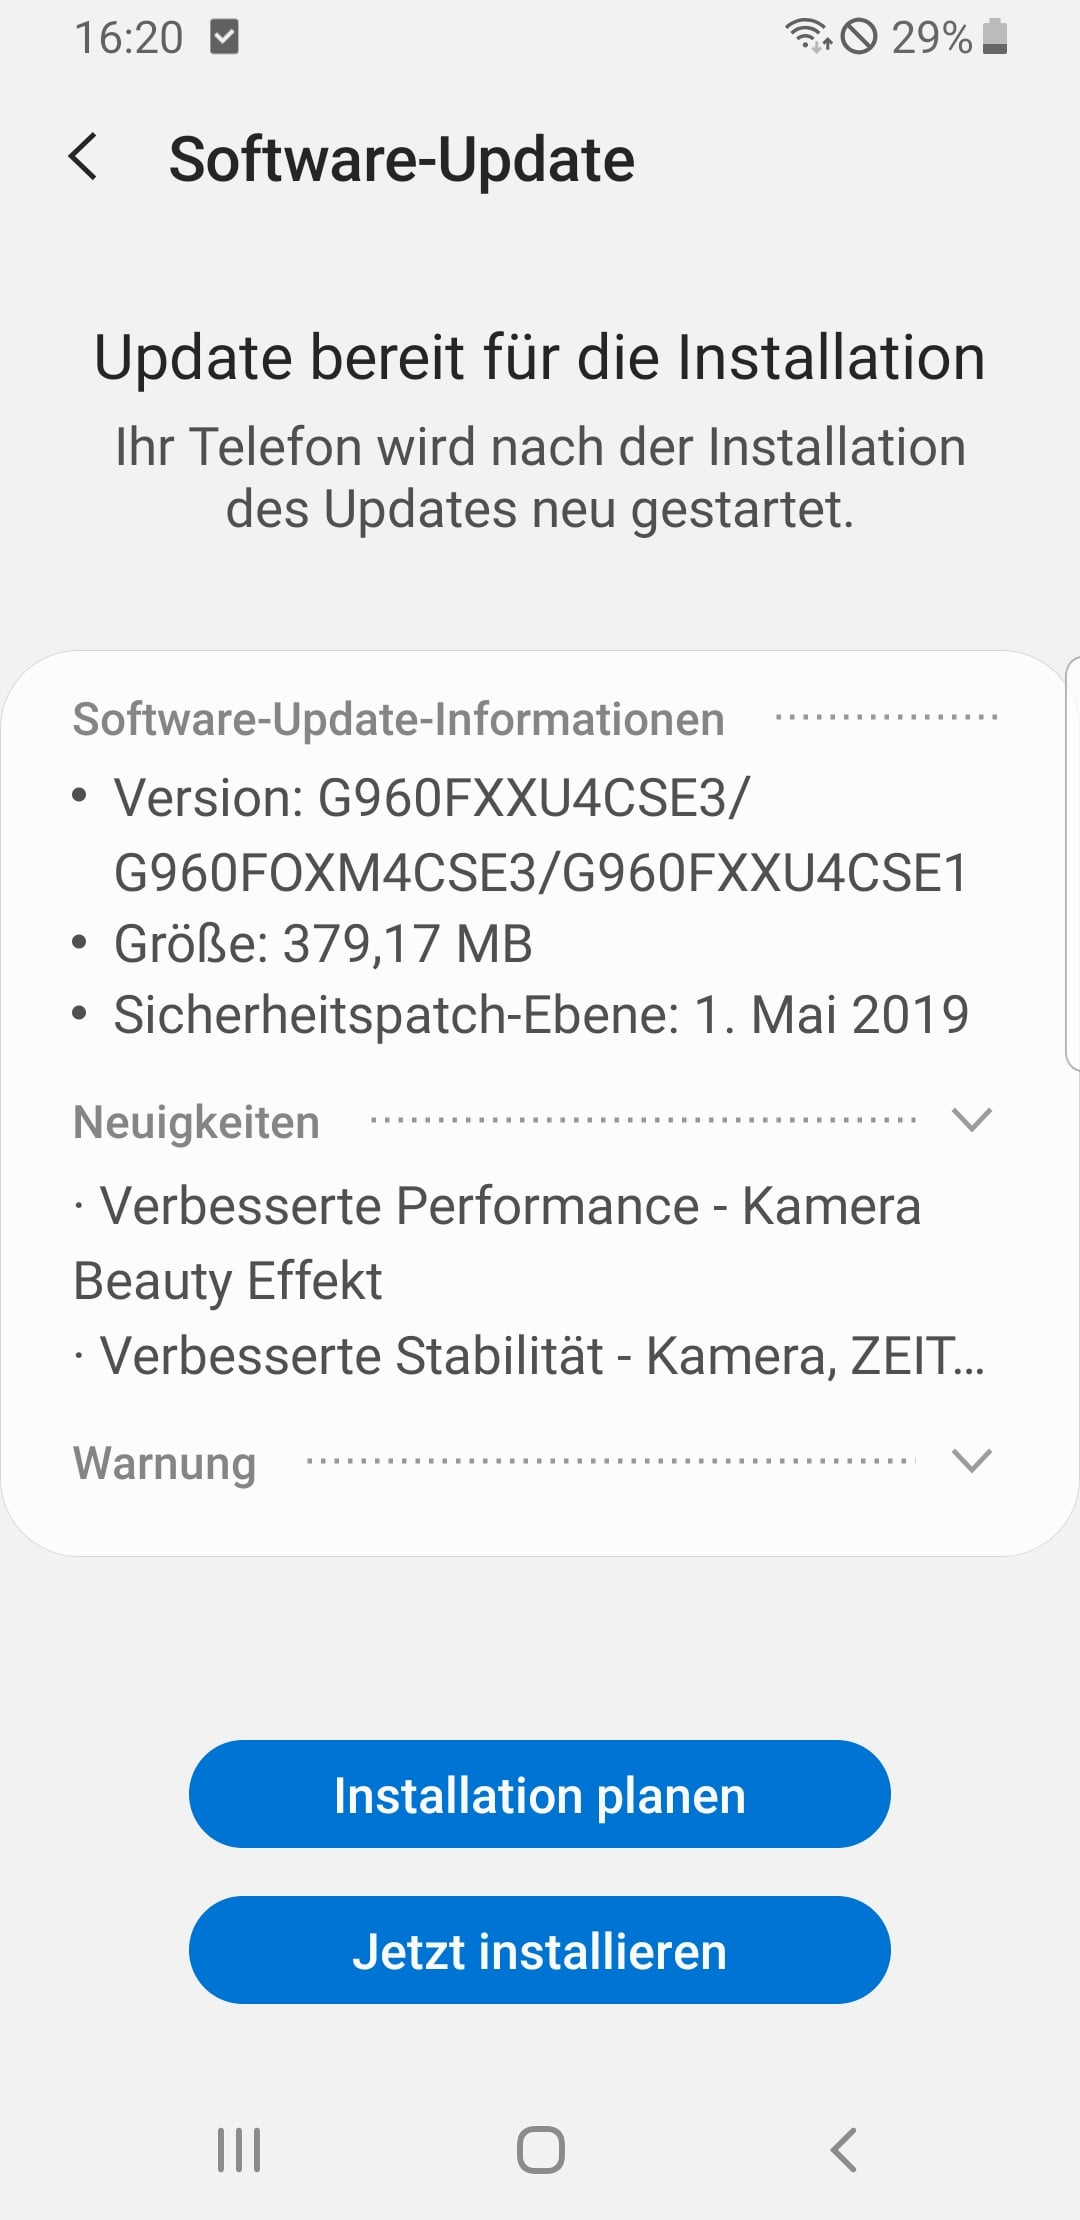 Galaxy S9 Update: Samsung bessert bei der Kamera nach 4 techboys.de • smarte News, auf den Punkt! Galaxy S9 Update: Samsung bessert bei der Kamera nach